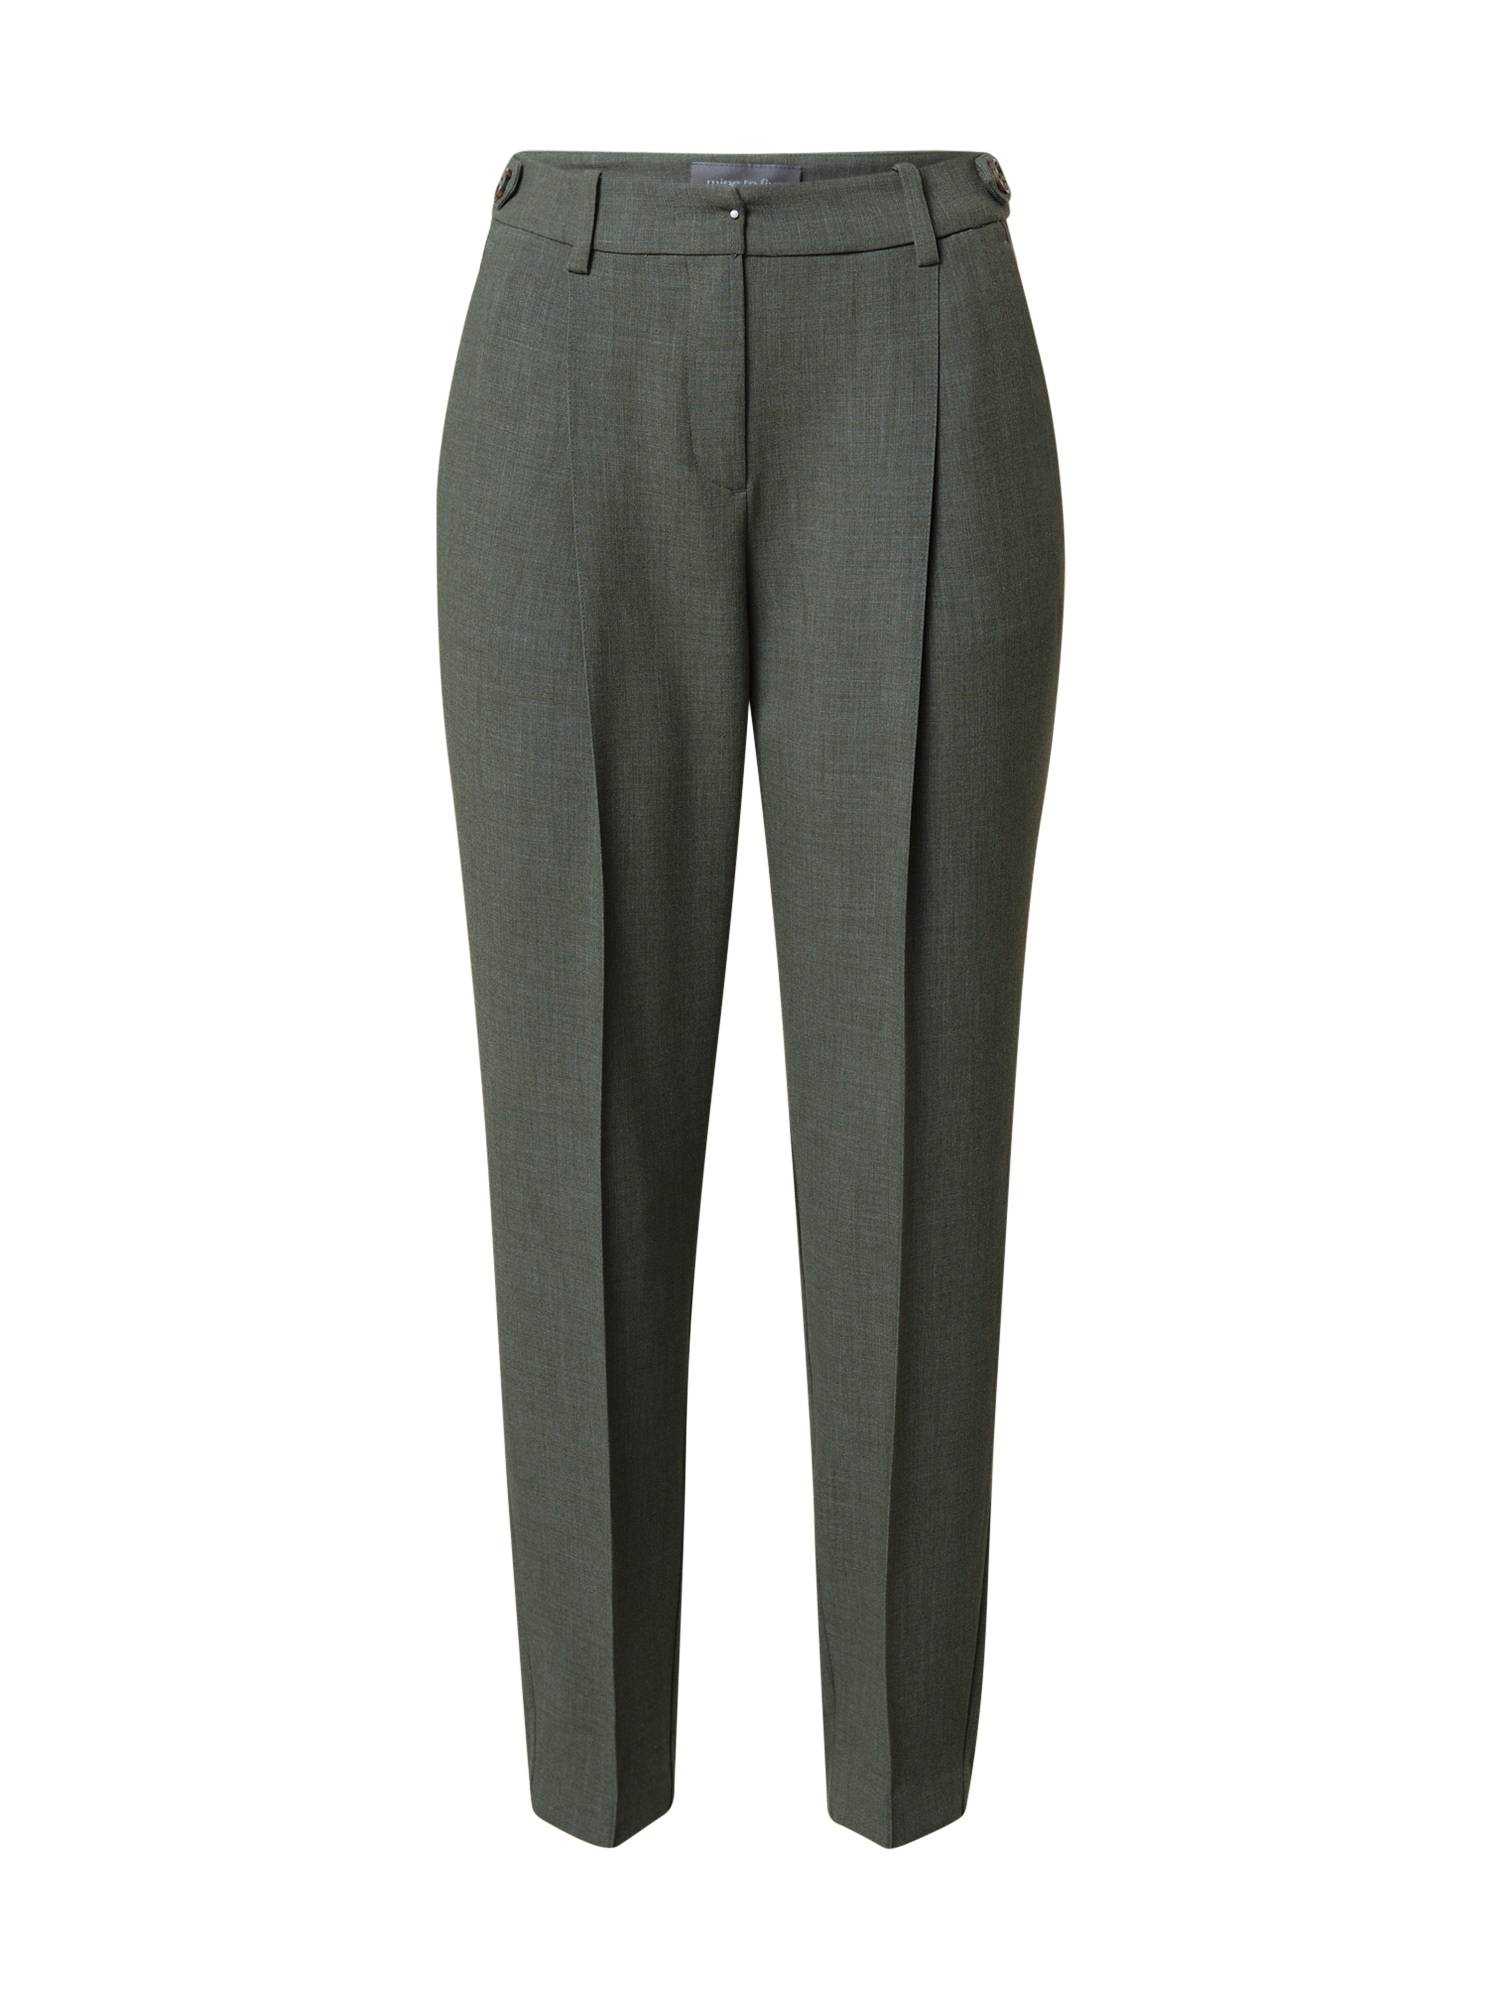 MINE TO FIVE Pantalon à pince  - Vert - Taille: 40 - female